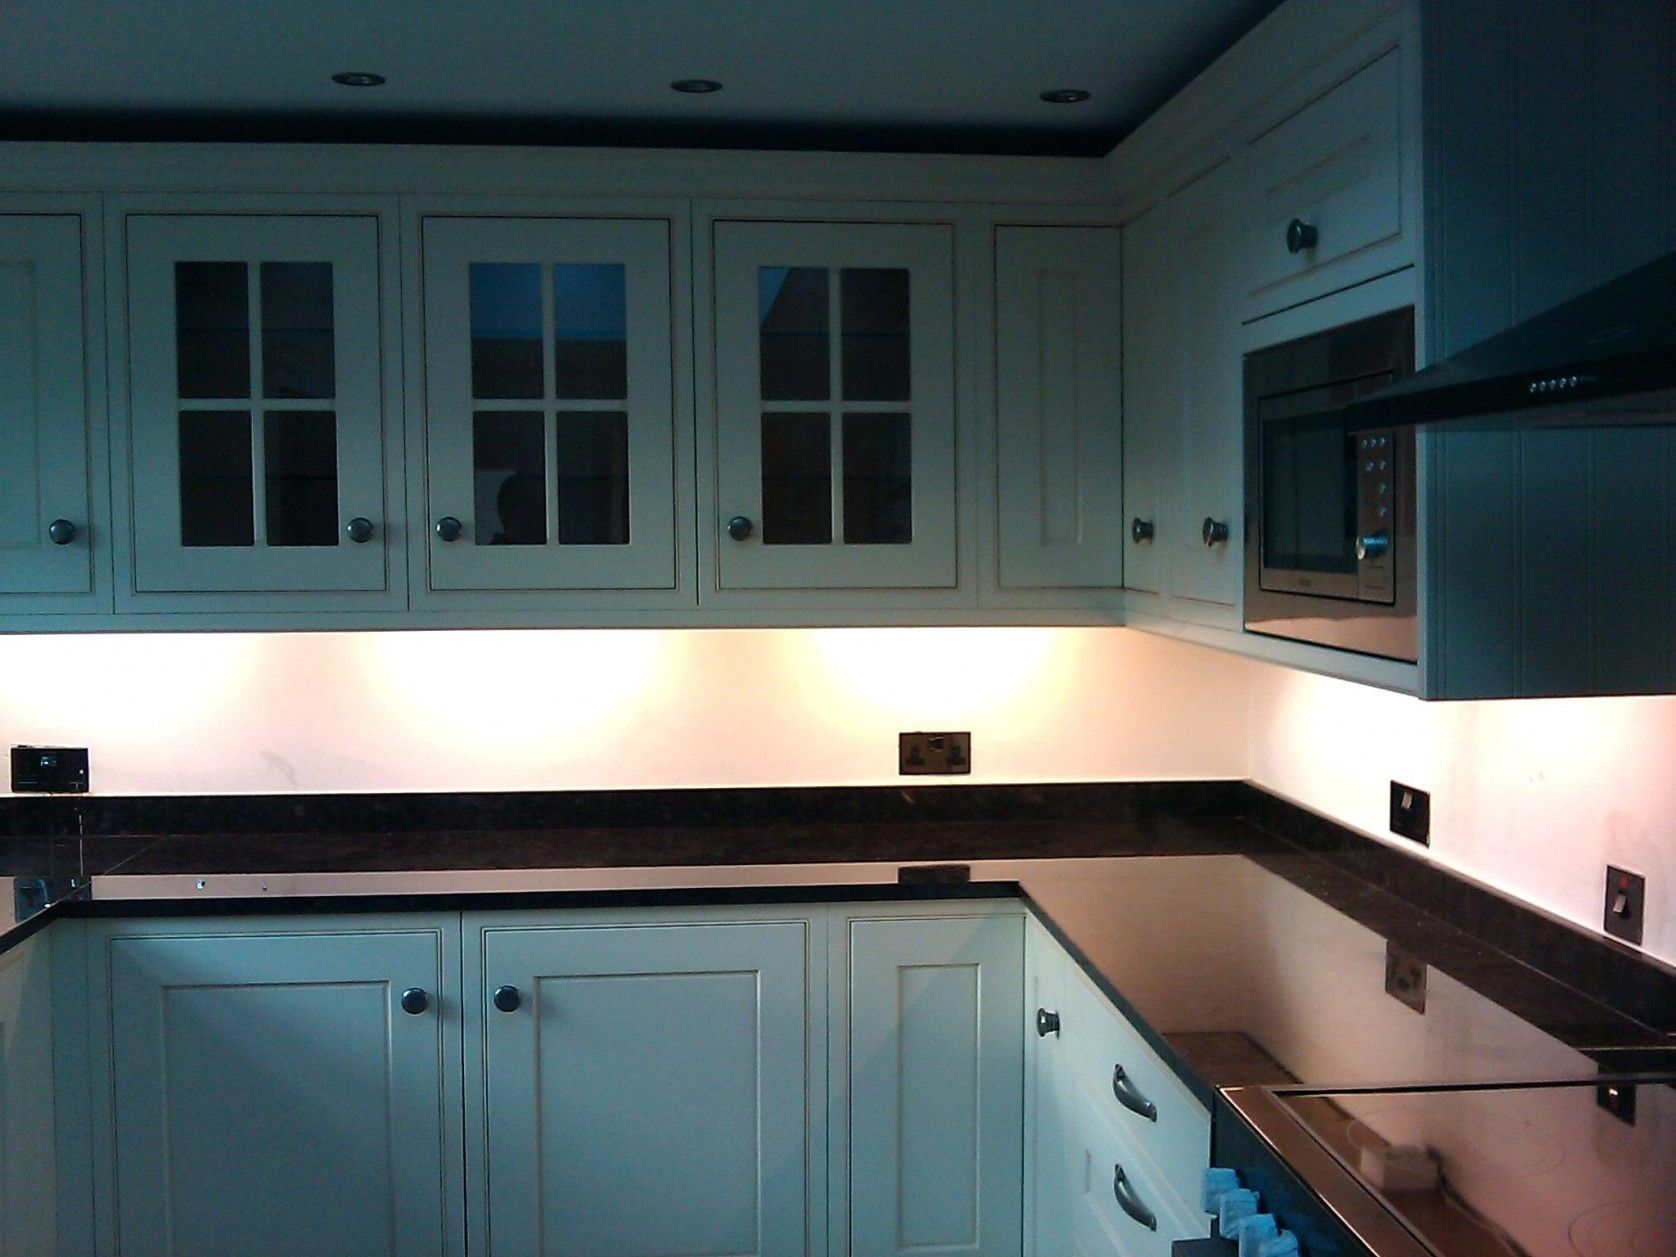 Kitchen Under Cabinet Professional Lighting Kit WARM WHITE LED Strip